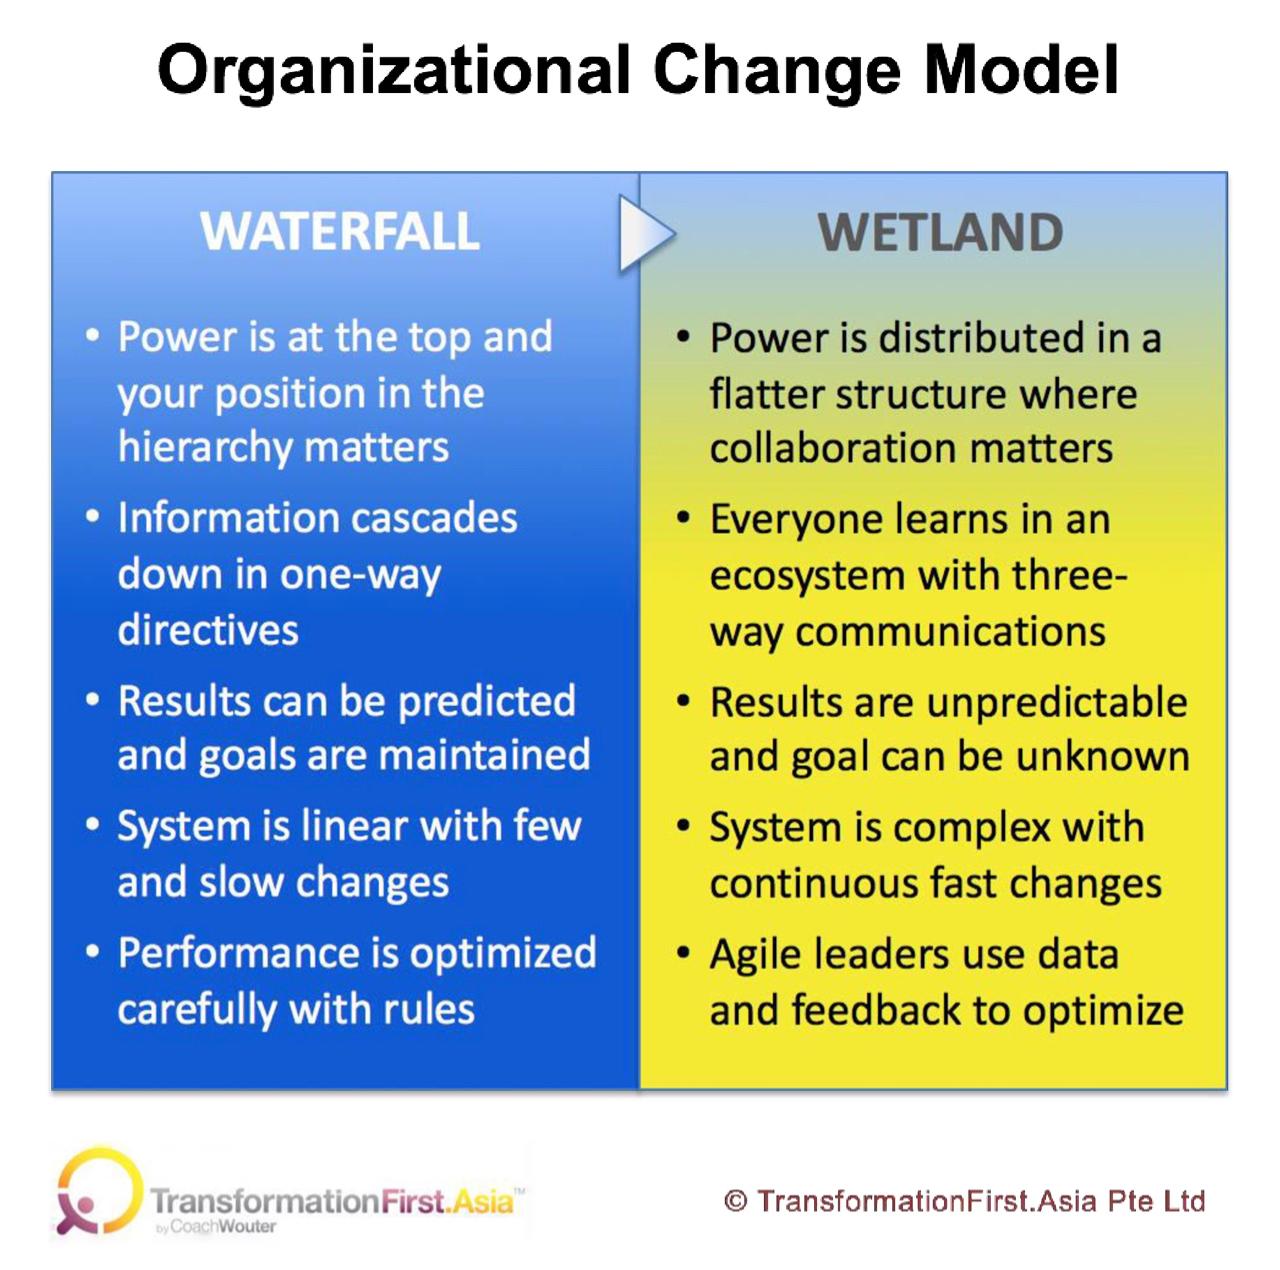 Organizational Change Model July 2018.jpg